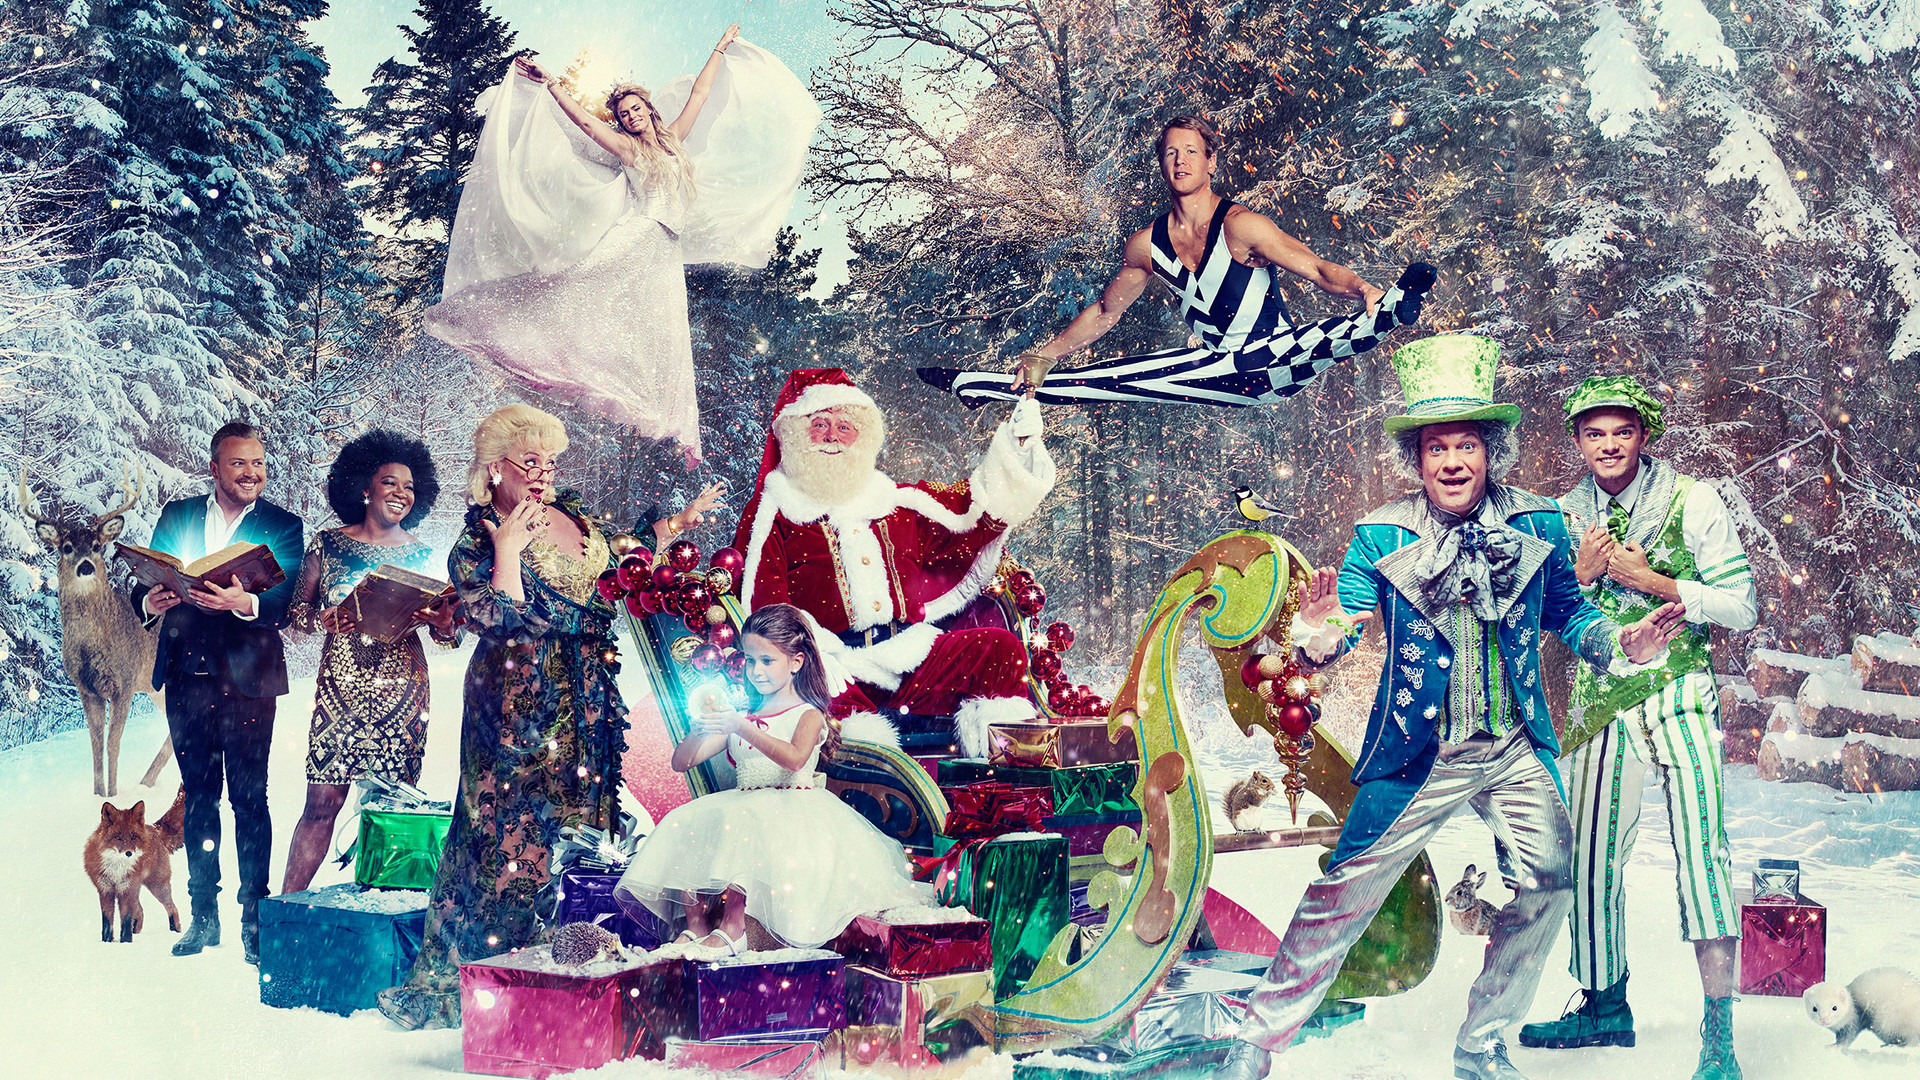 Leona Philippo, De Kerstman, Nicolette van Dam, Eefje, Epke Zonderland, Buddy Vedder, Carlo Boszhard en Jamai Loman